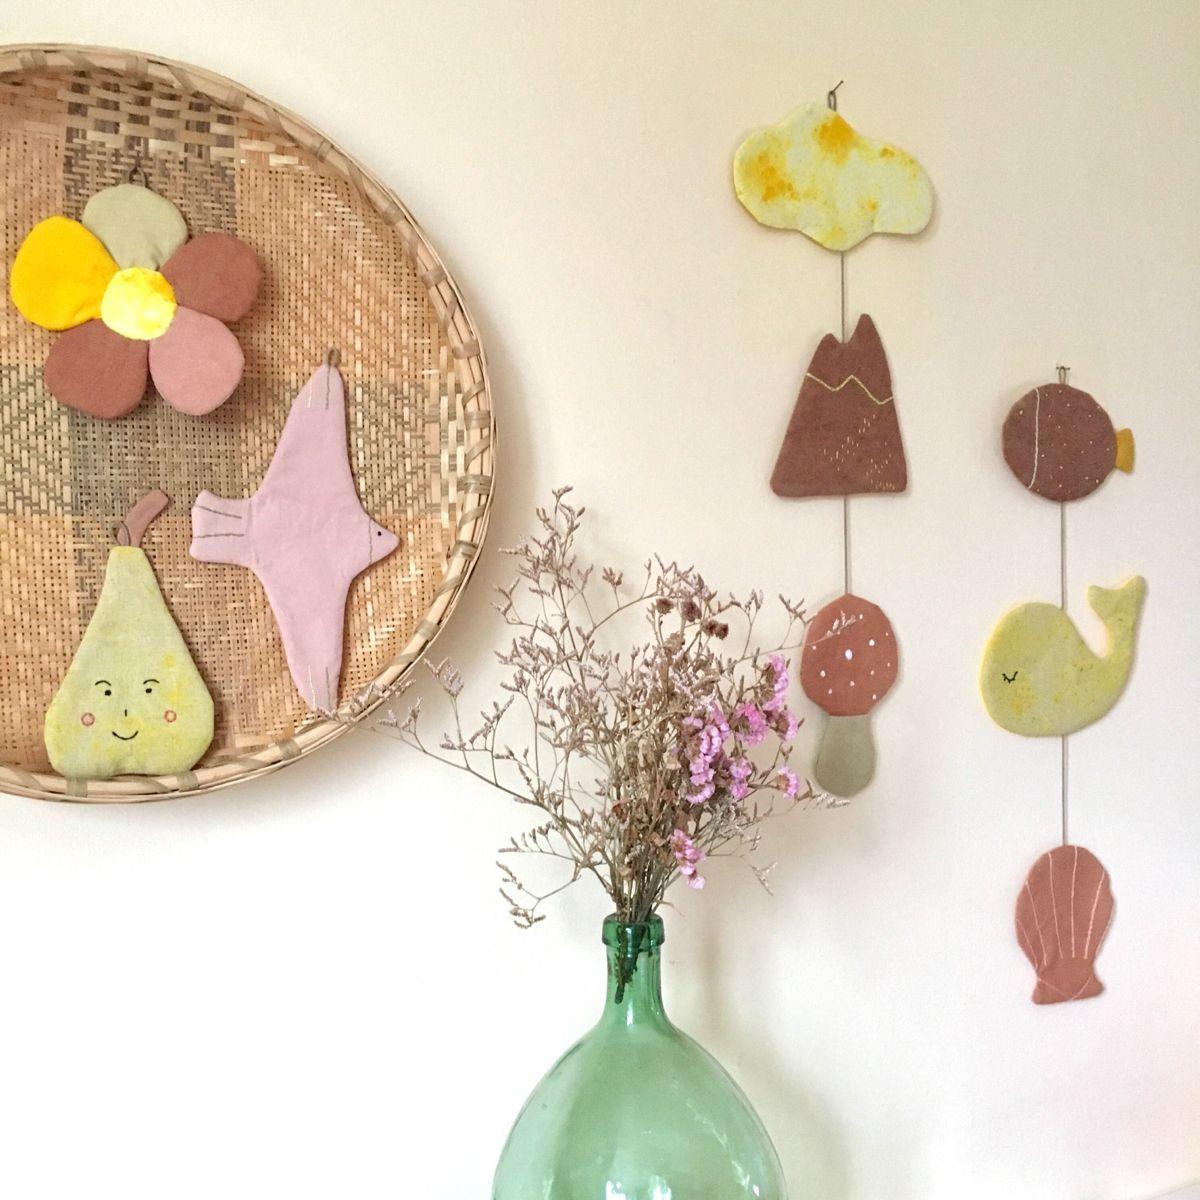 #broderiemoderne #embroidery #teinturevegetale #teinturenaturelle #naturaldye #botanicaldye #plantdye #kidsdecor #decoenfant